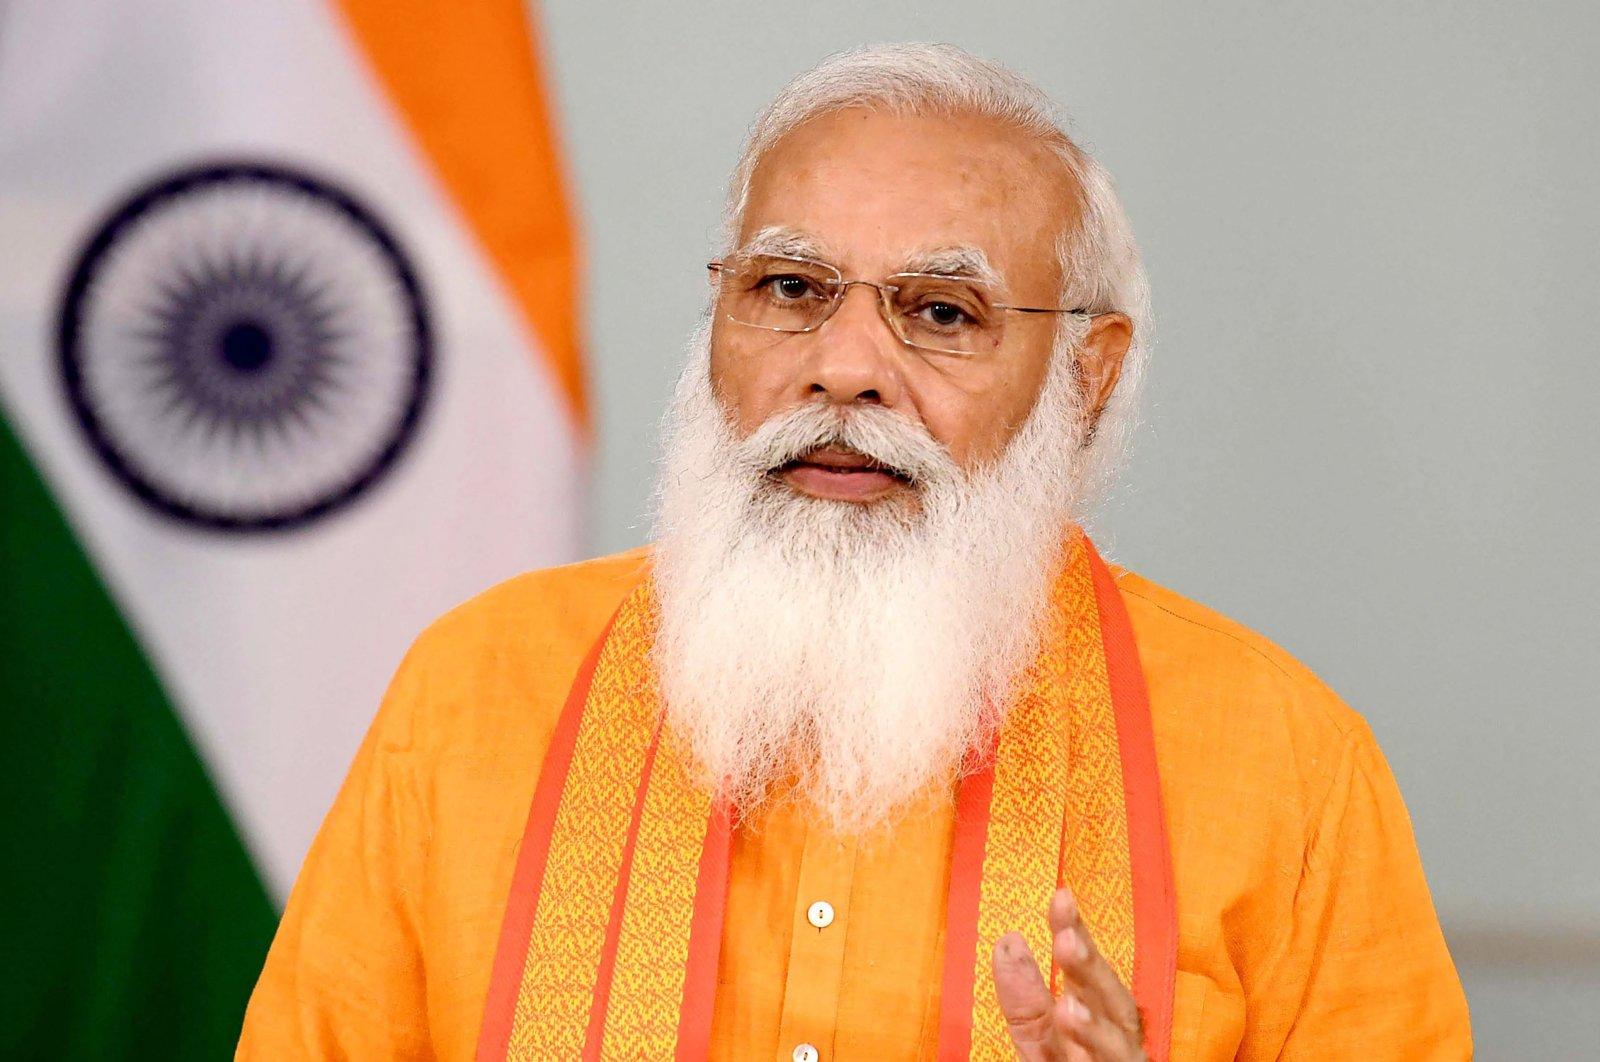 Indian Prime Minister Narendra Modi addressing the 7th International Yoga Day program, through video conferencing, in New Delhi, India, June 21, 2021. (Indian Press Information Bureau (PIB) via AFP)